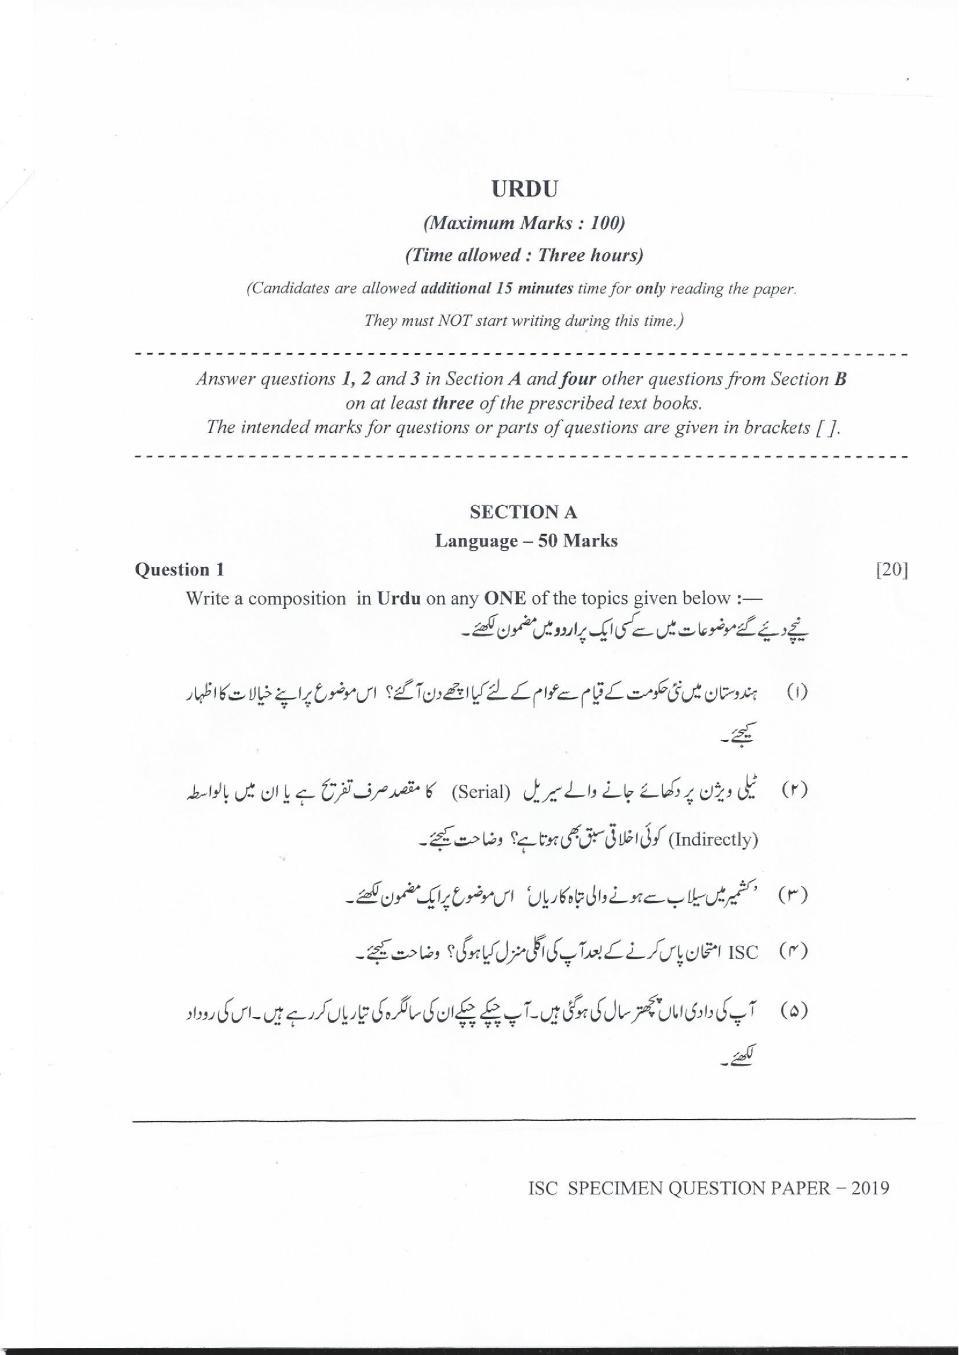 ISC Class 12 Specimen Paper 2019 for Urdu - Page 1